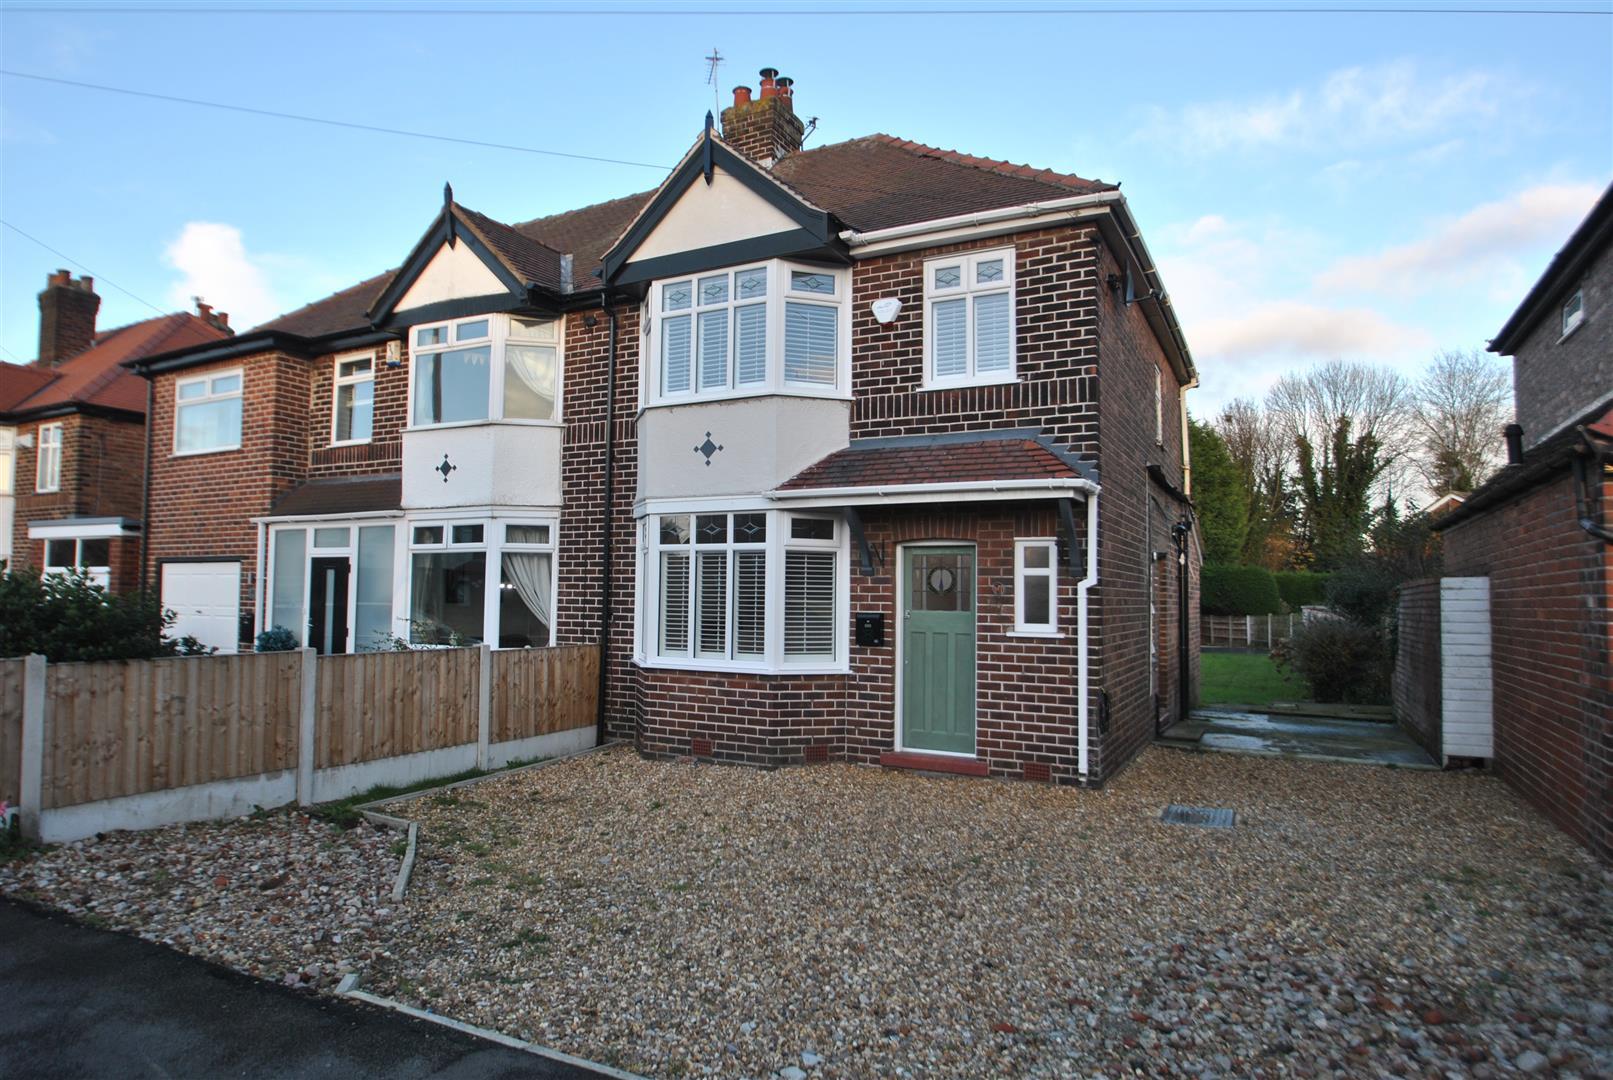 3 Bedrooms Semi Detached House for sale in Lindi Avenue, GRAPPENHALL, Warrington, WA4